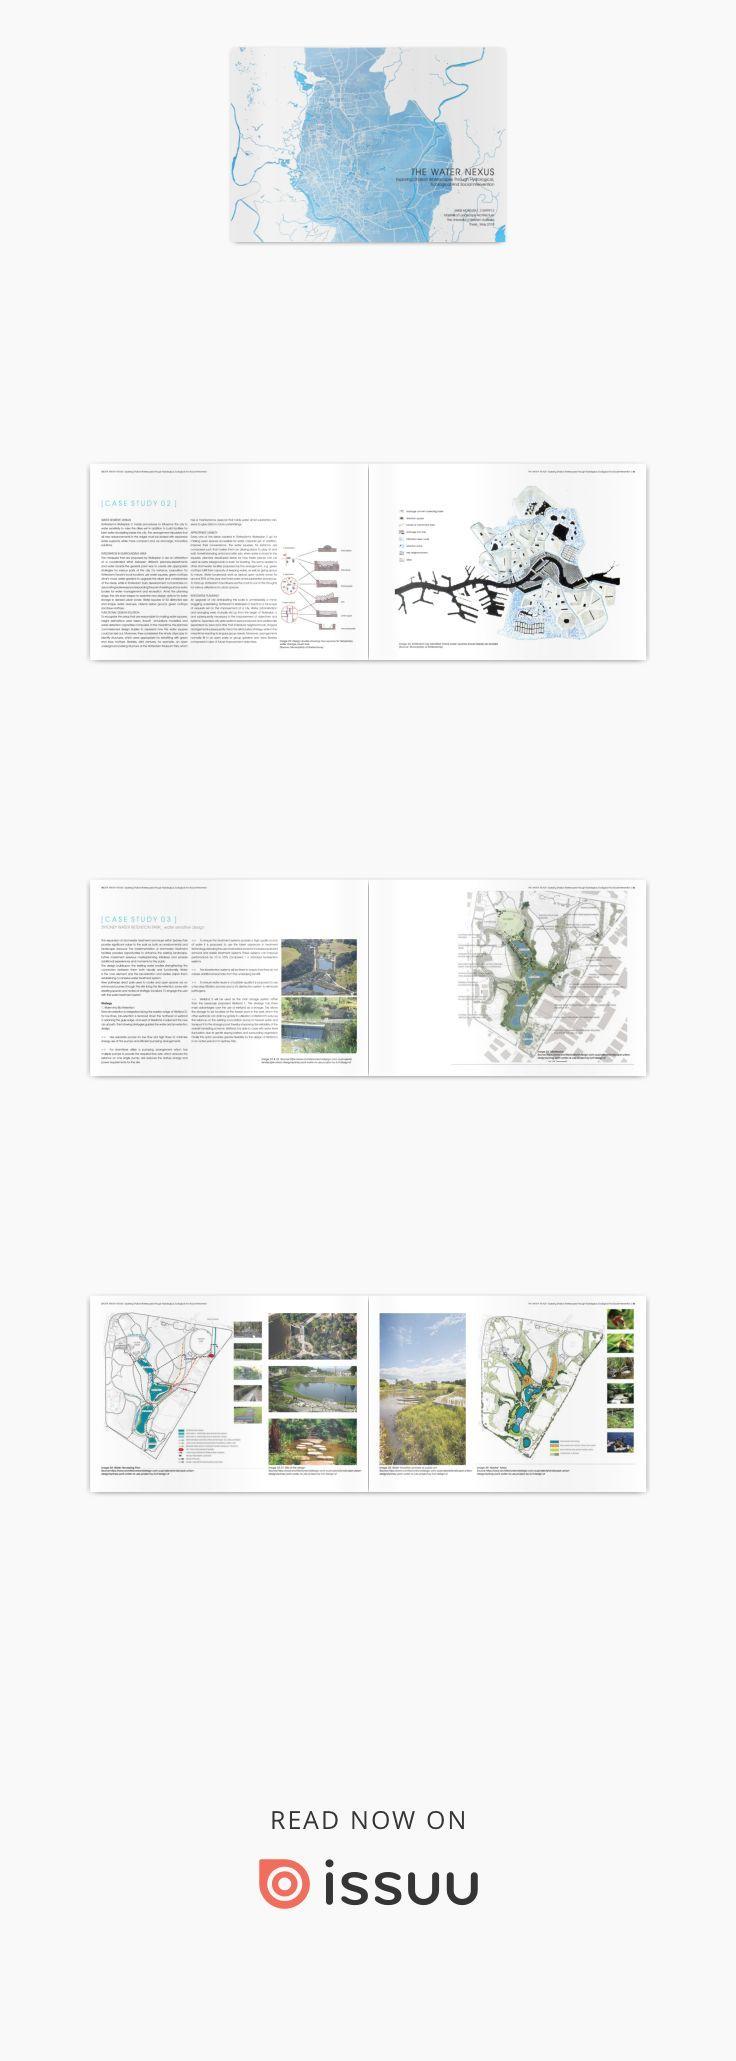 Sakib Mortuza Master Of Landscape Architecture Thesi A Water Sensitive Desi Plan Model Dissertation Pdf